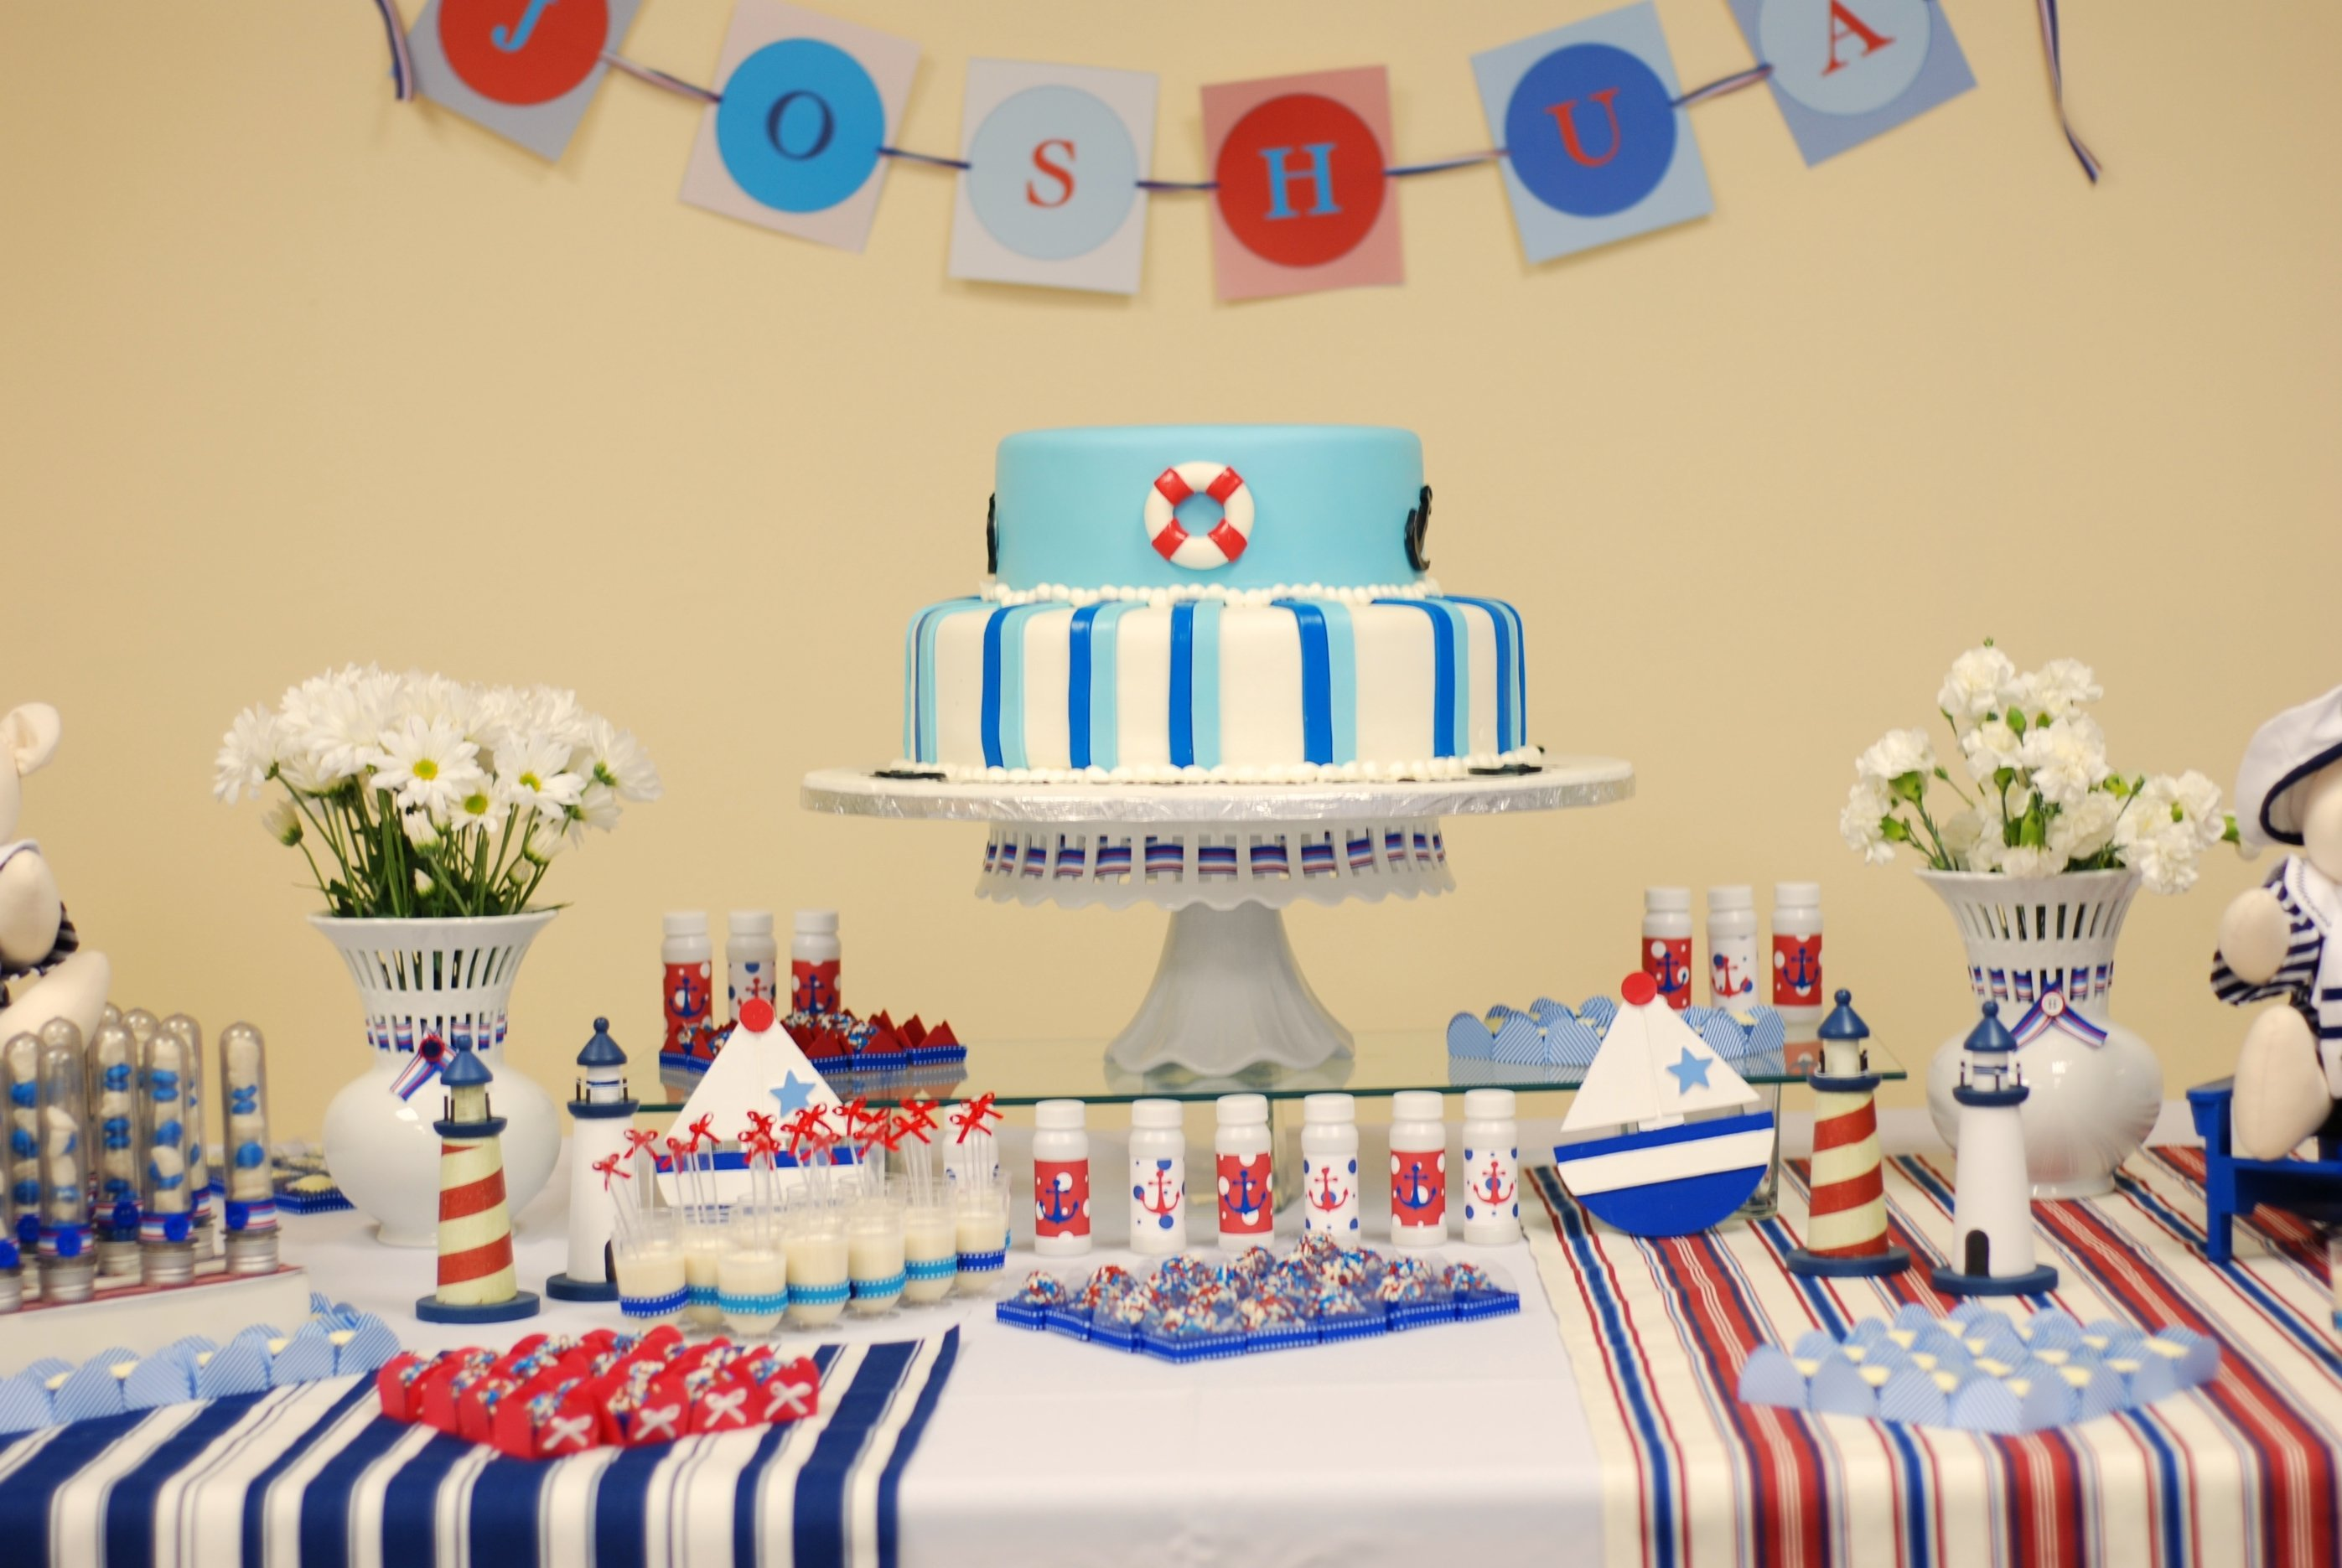 10 Stylish 1St Birthday Party Decoration Ideas boys birthday party decoration ideas decorideaz decorideaz 4